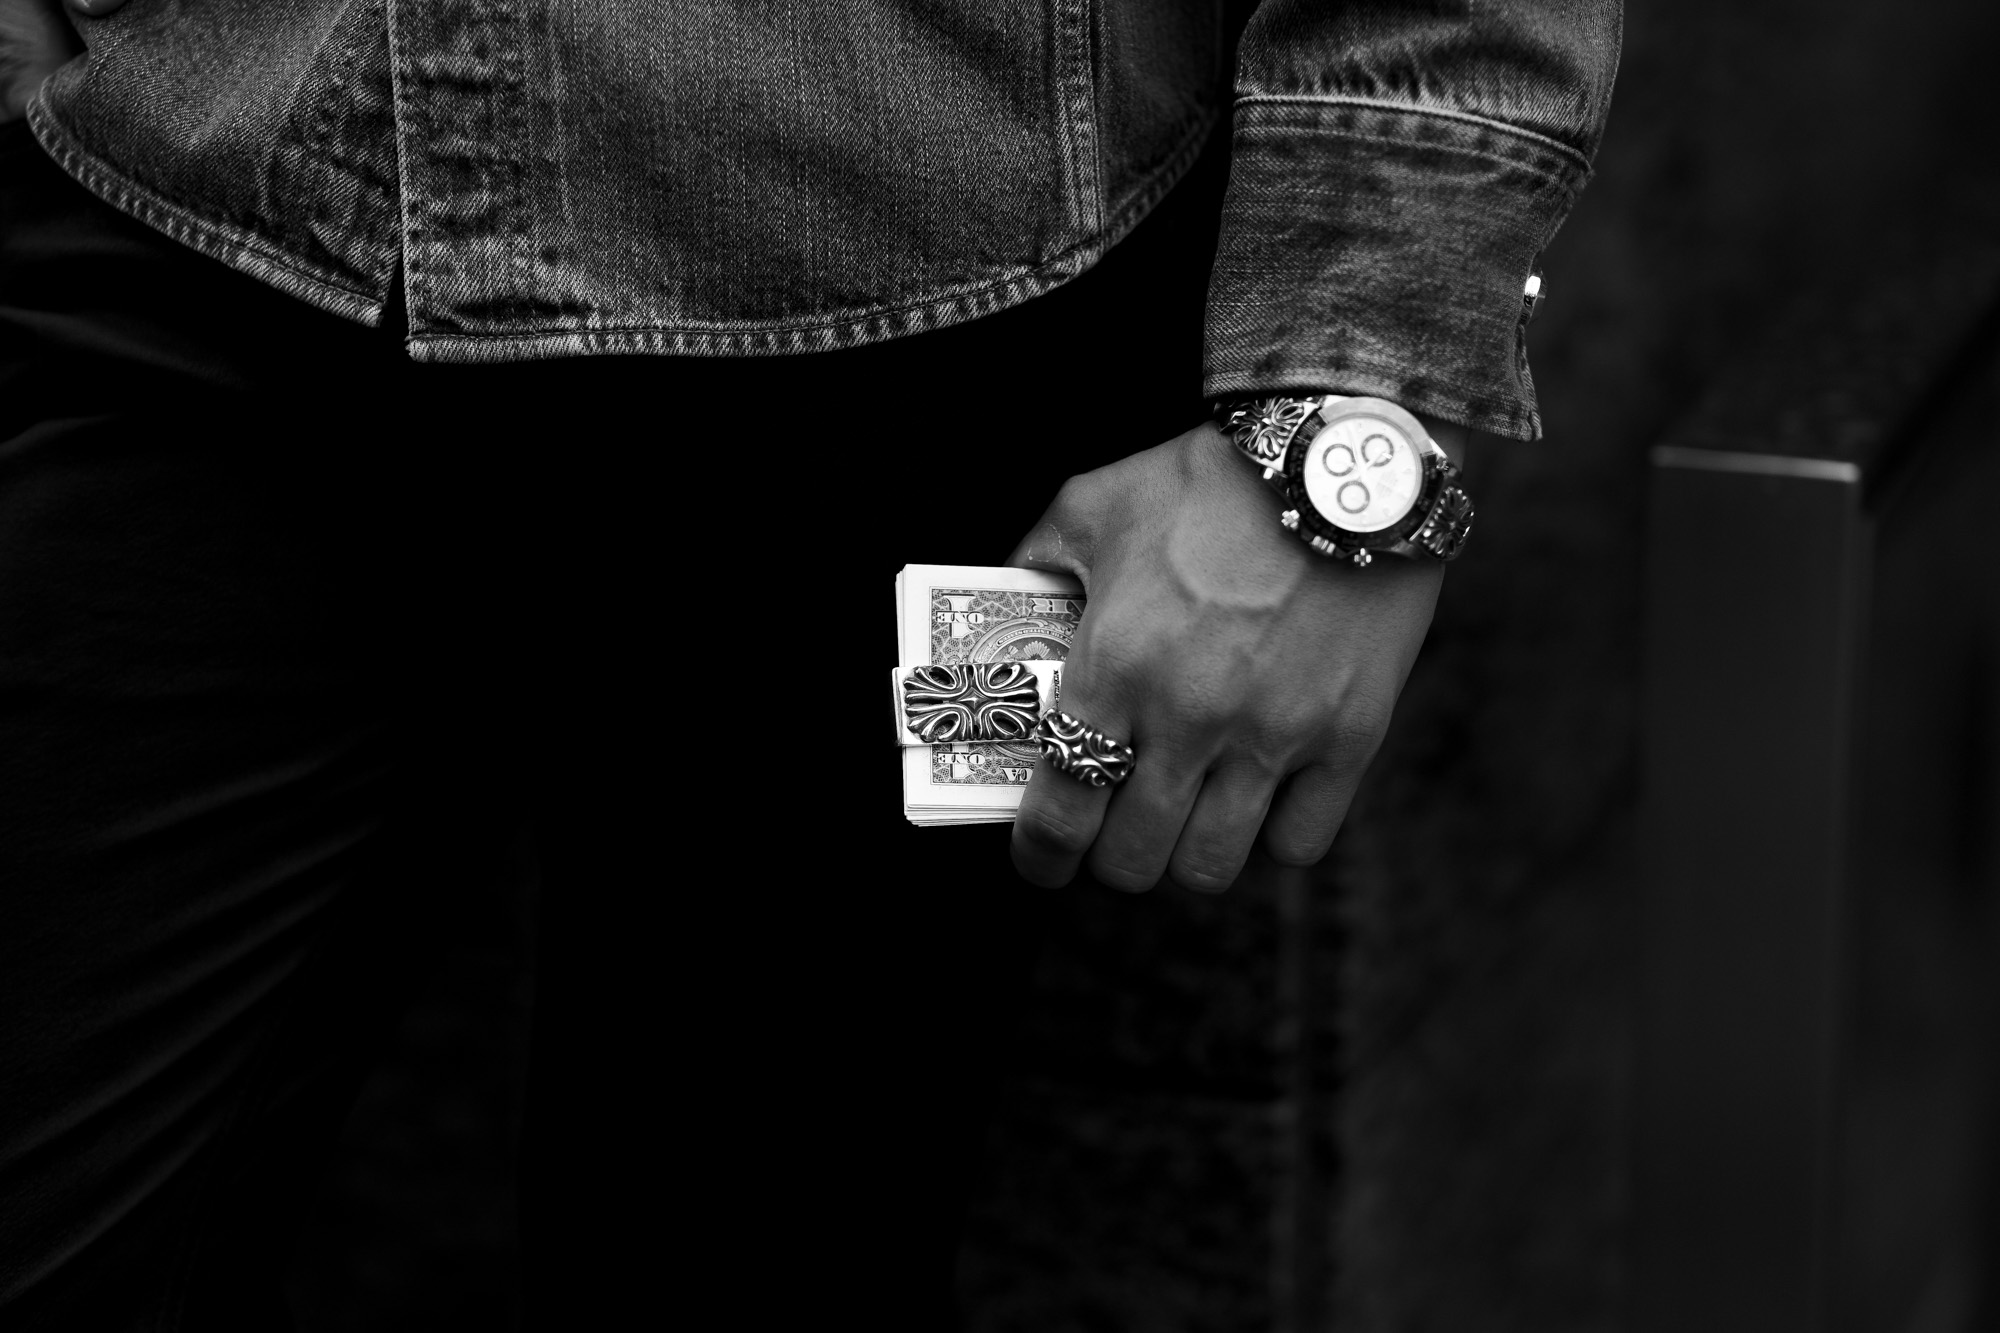 Balvenie Wilhelm (バルヴェニー ヴィルヘルム) Valentine Money clip 925 SILVER バレンタイン マネークリップ SILVER (シルバー) Made In England (イギリス製) 2021 【ご予約受付中】愛知 名古屋 Alto e Diritto altoediritto アルトエデリット 925シルバー スターリングシルバー シルバーアクセサリー